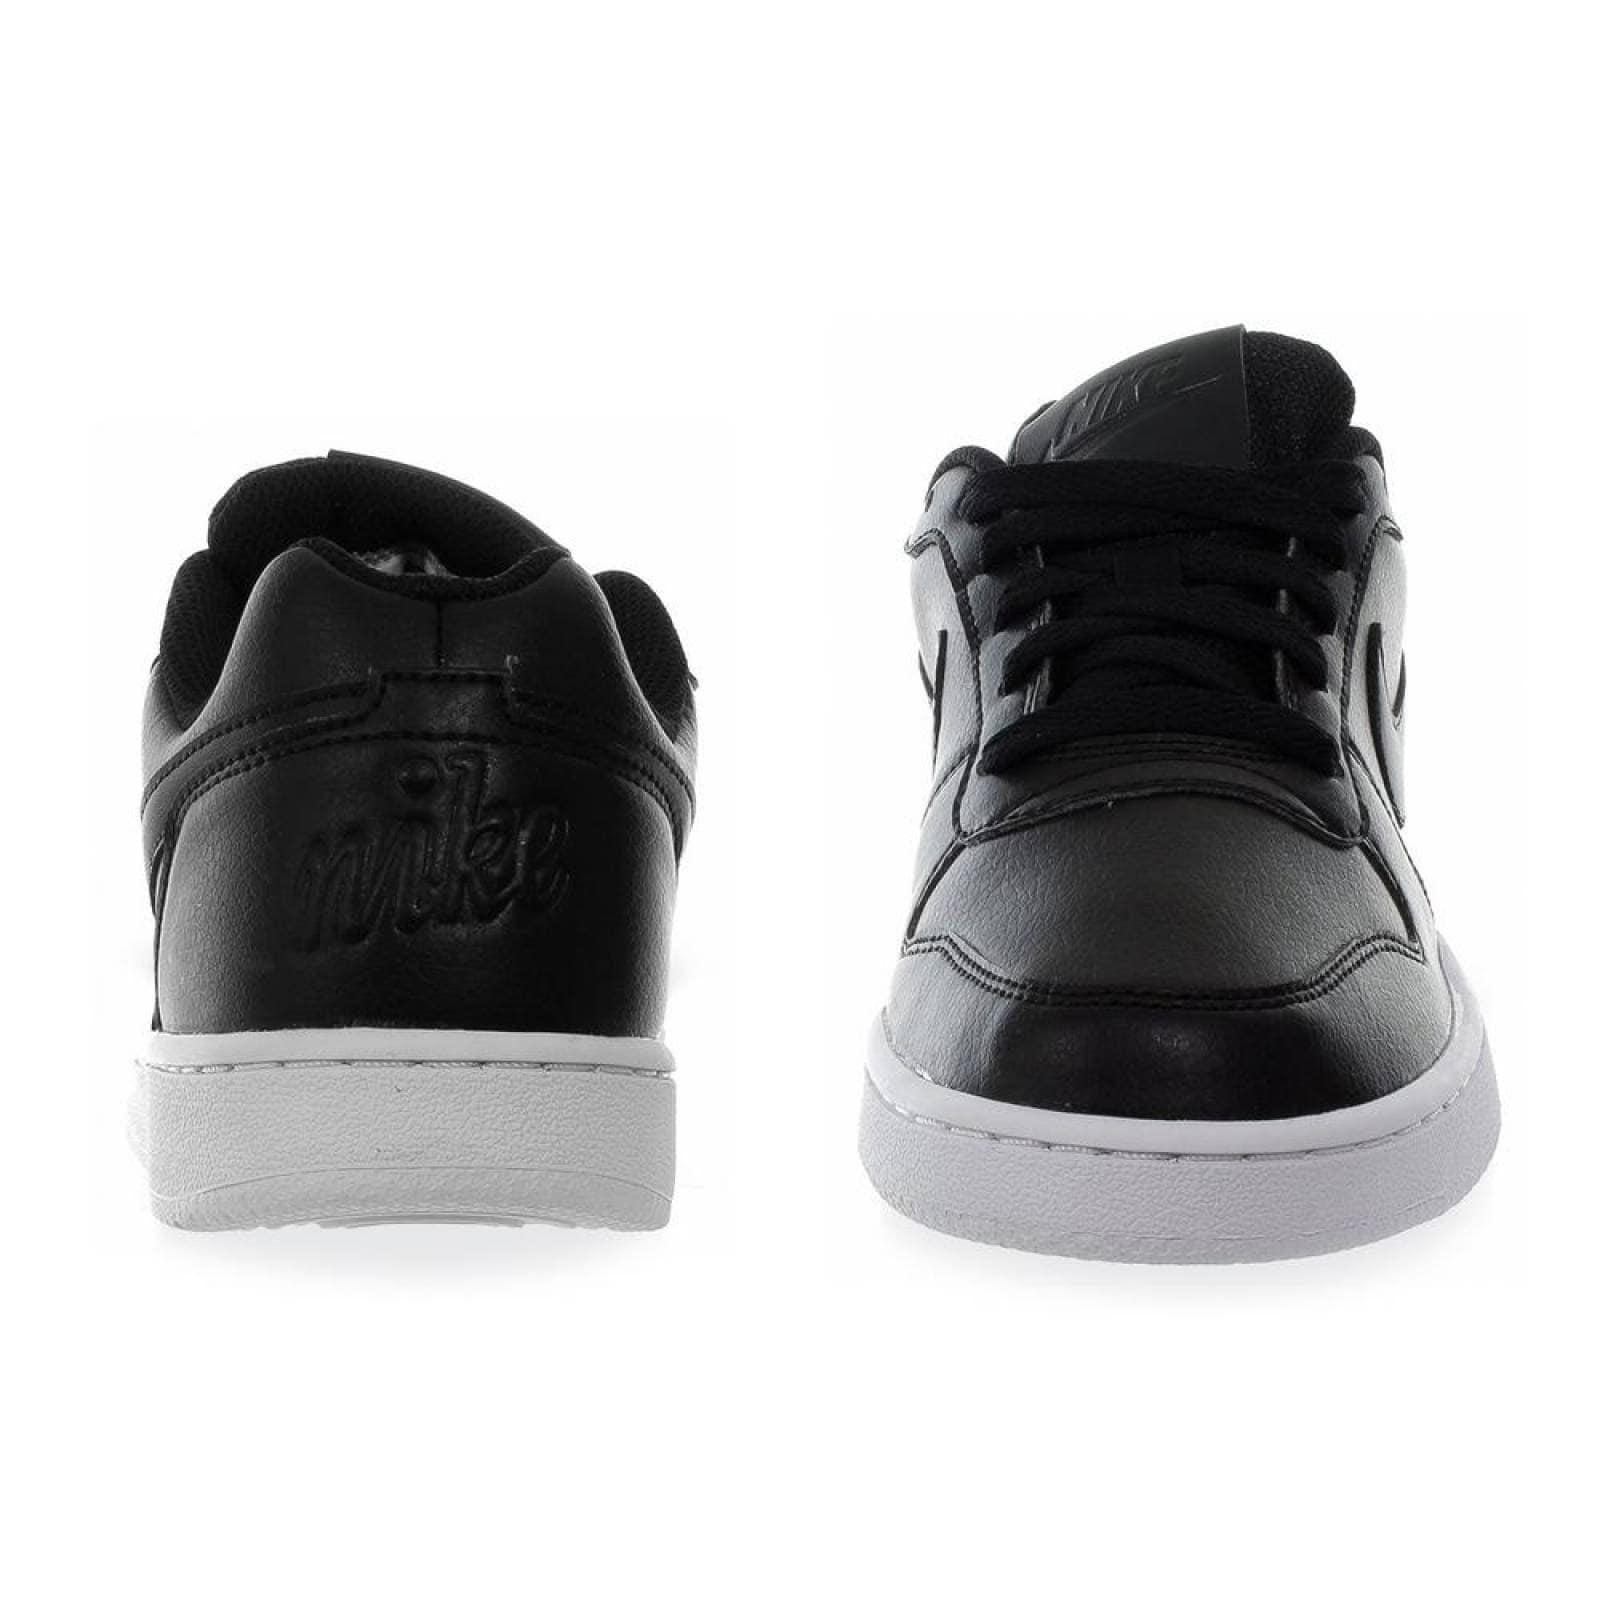 Tenis Nike Ebernon Low AQ1777001 Negro Mujer